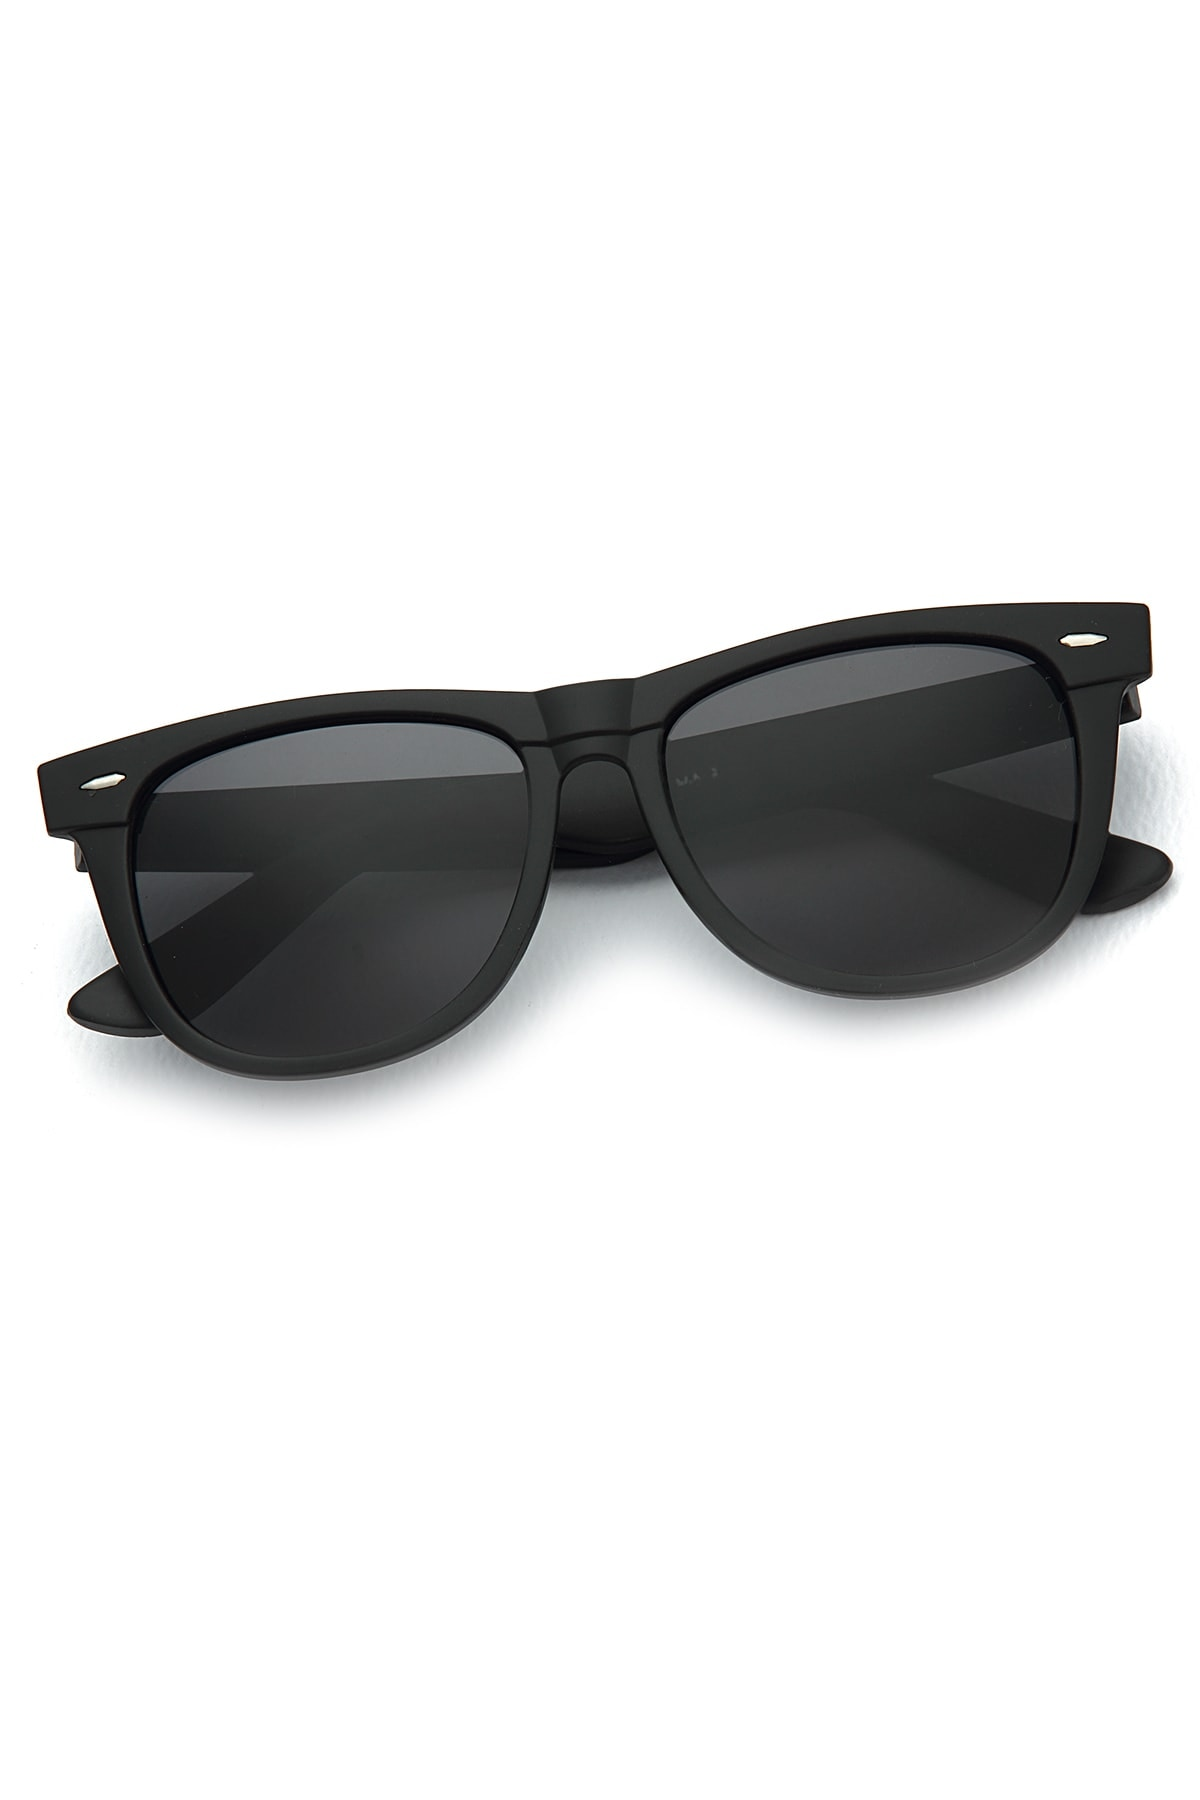 Aqua Di Polo Apss025201 de los hombres gafas de sol Rayban diseño APSS025201